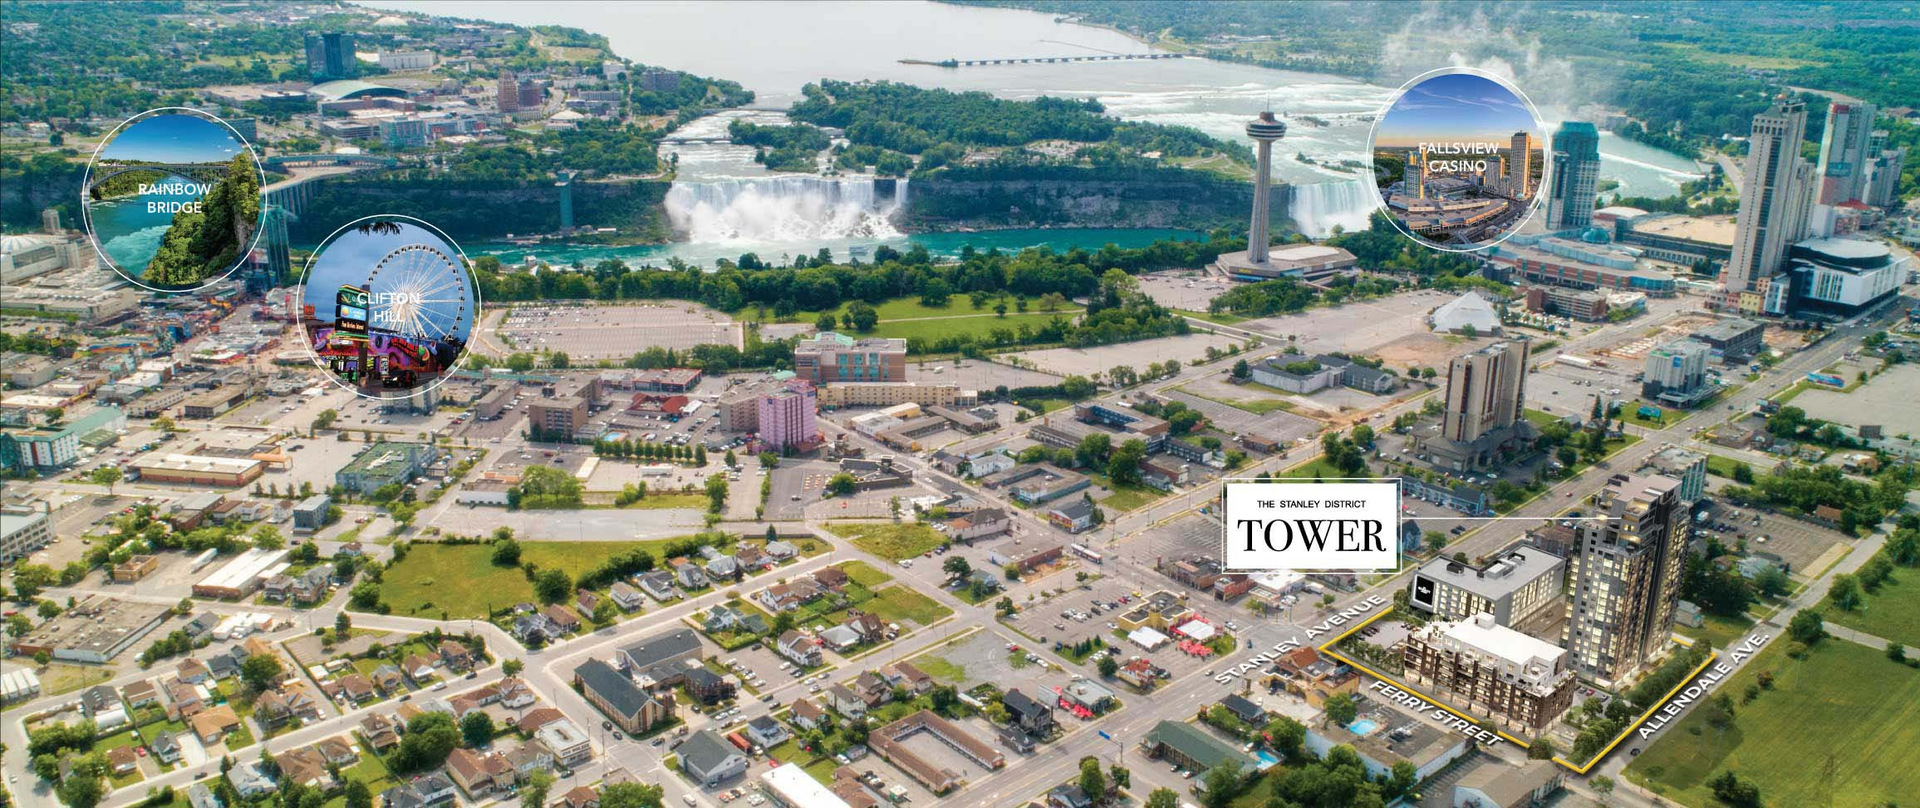 Map of Luxury Condos In Niagara Falls